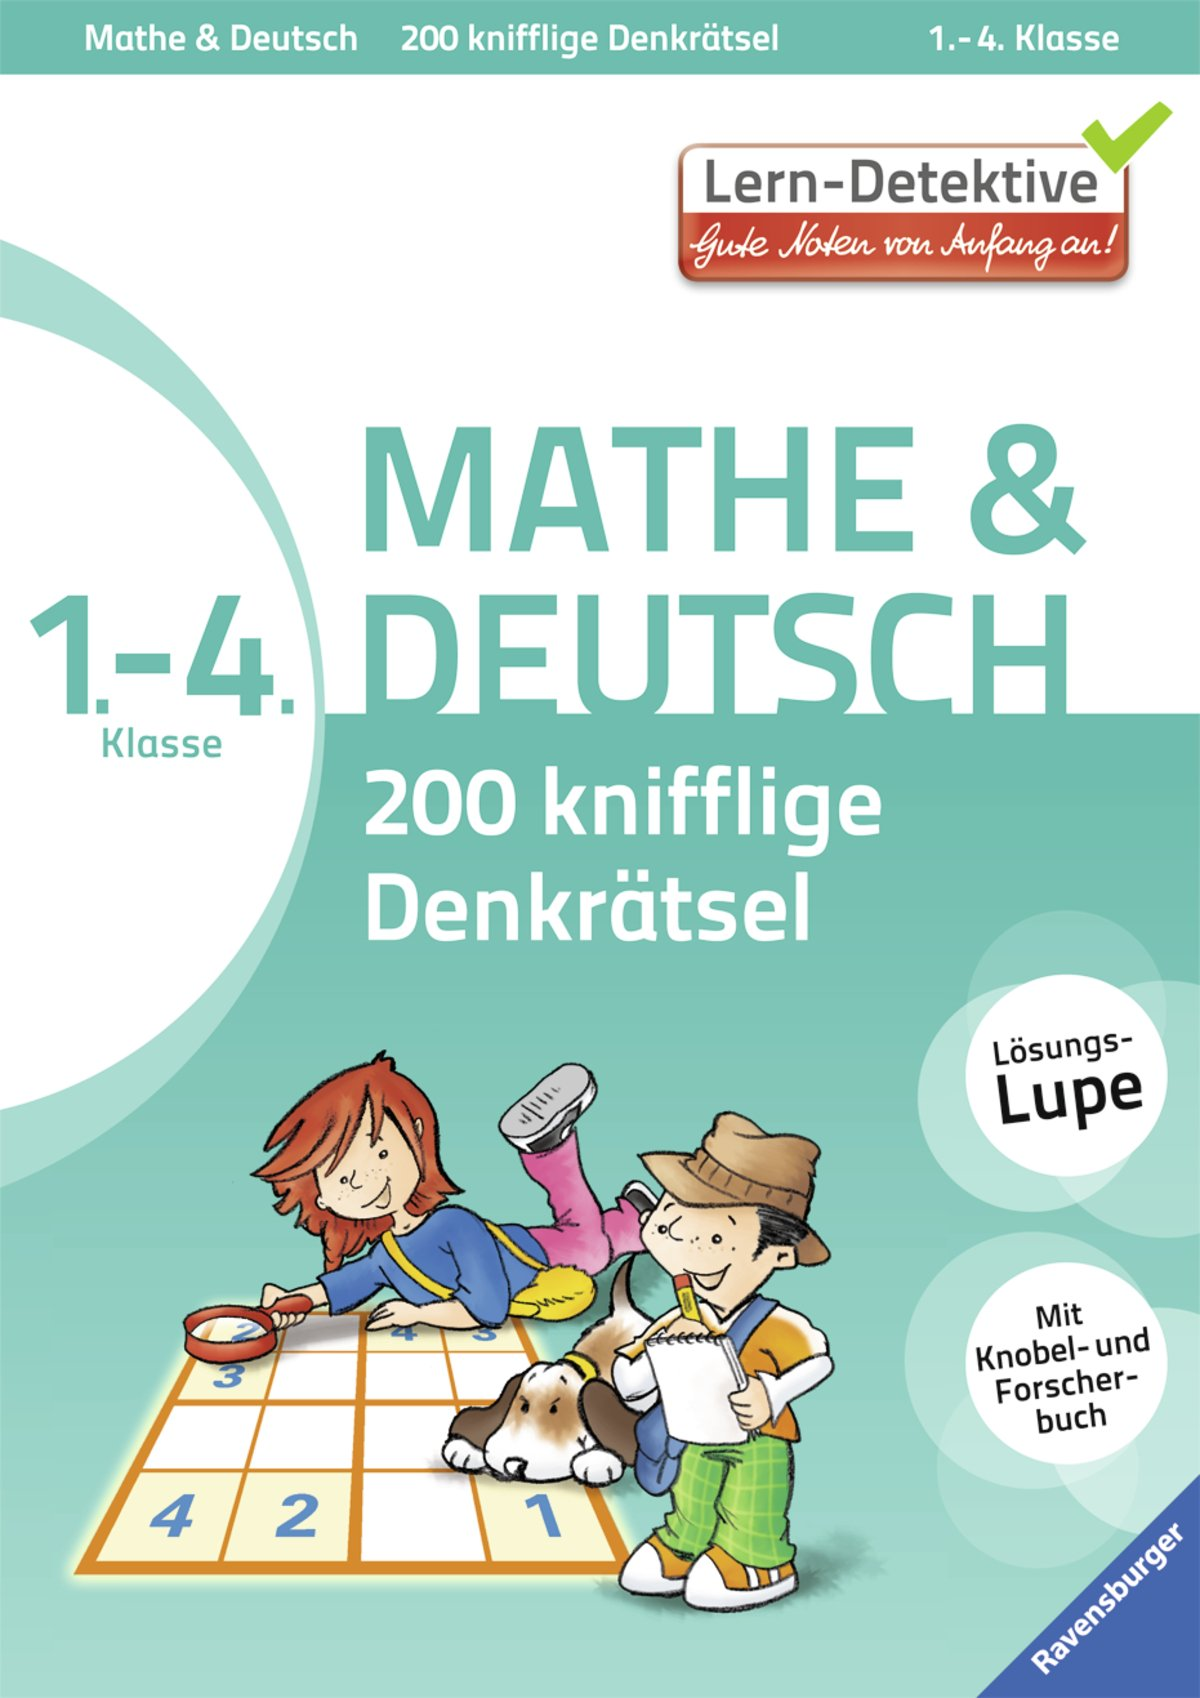 200 knifflige Denkrätsel Mathe & Deutsch 1. - 4. Klasse (Lern-Detektive)